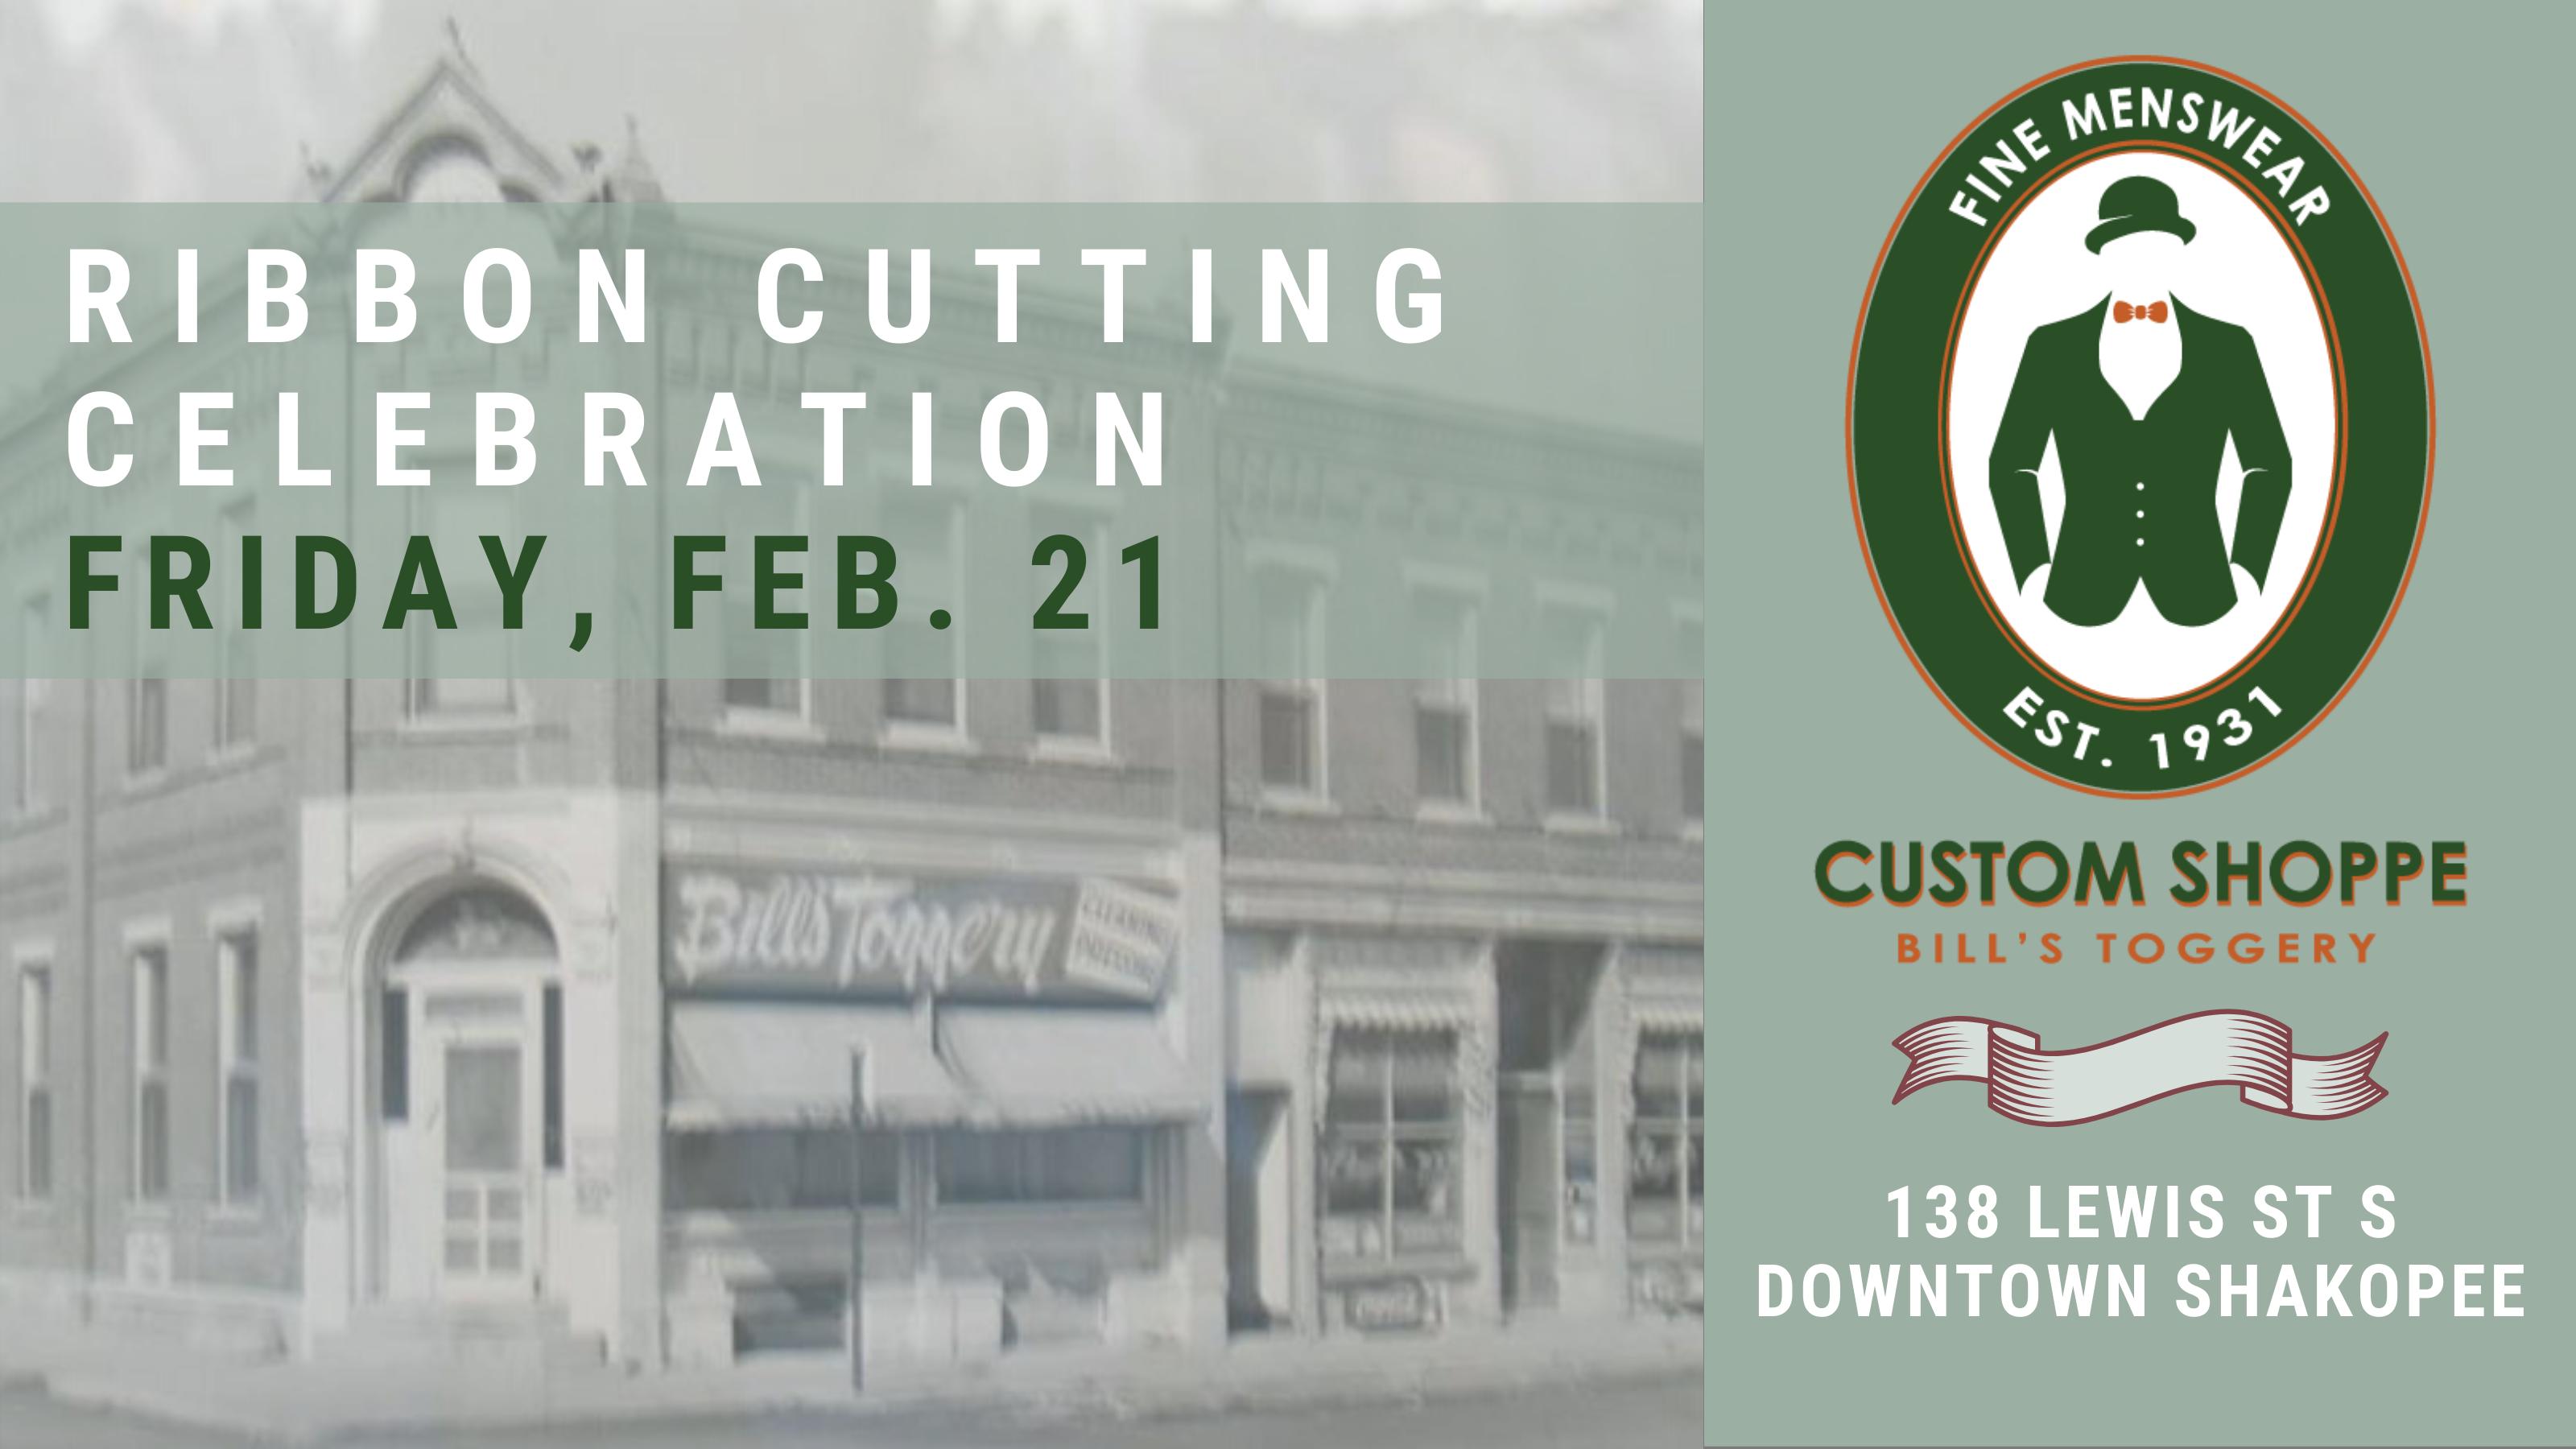 Ribbon Cutting Celebration Custom Shoppe Bill's Toggery